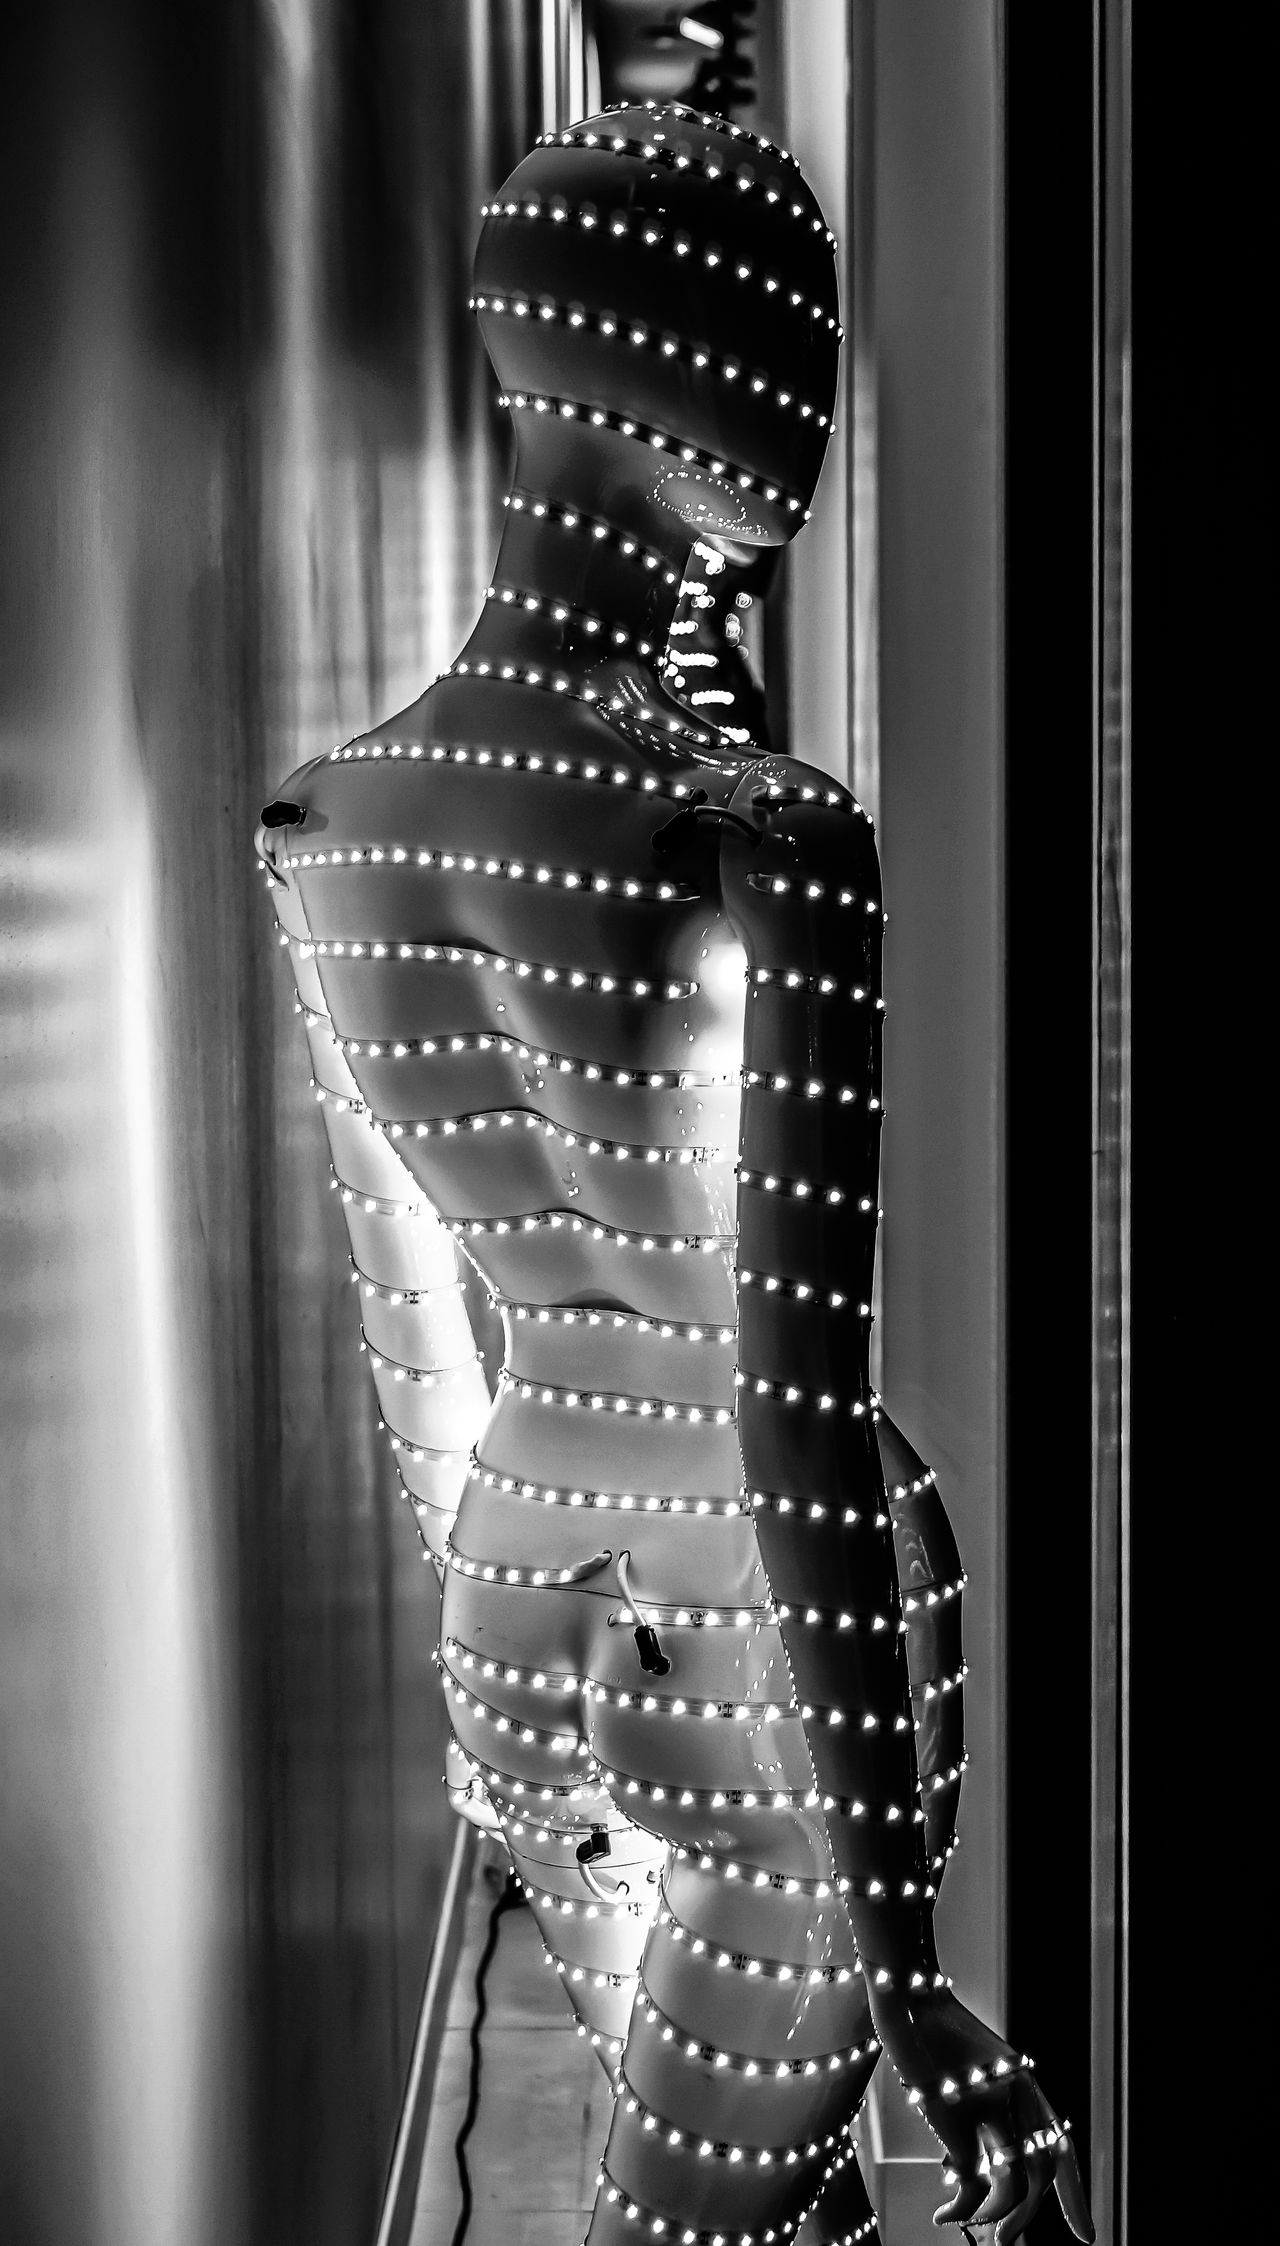 Gruss an Christian ;-) Art Black & White Black And White Dummy Electric Light EyeEm Best Shots EyeEm Gallery EyeEmBestPics Fashion Indoors  Lifestyles Night One Person Shopfront Standing Women